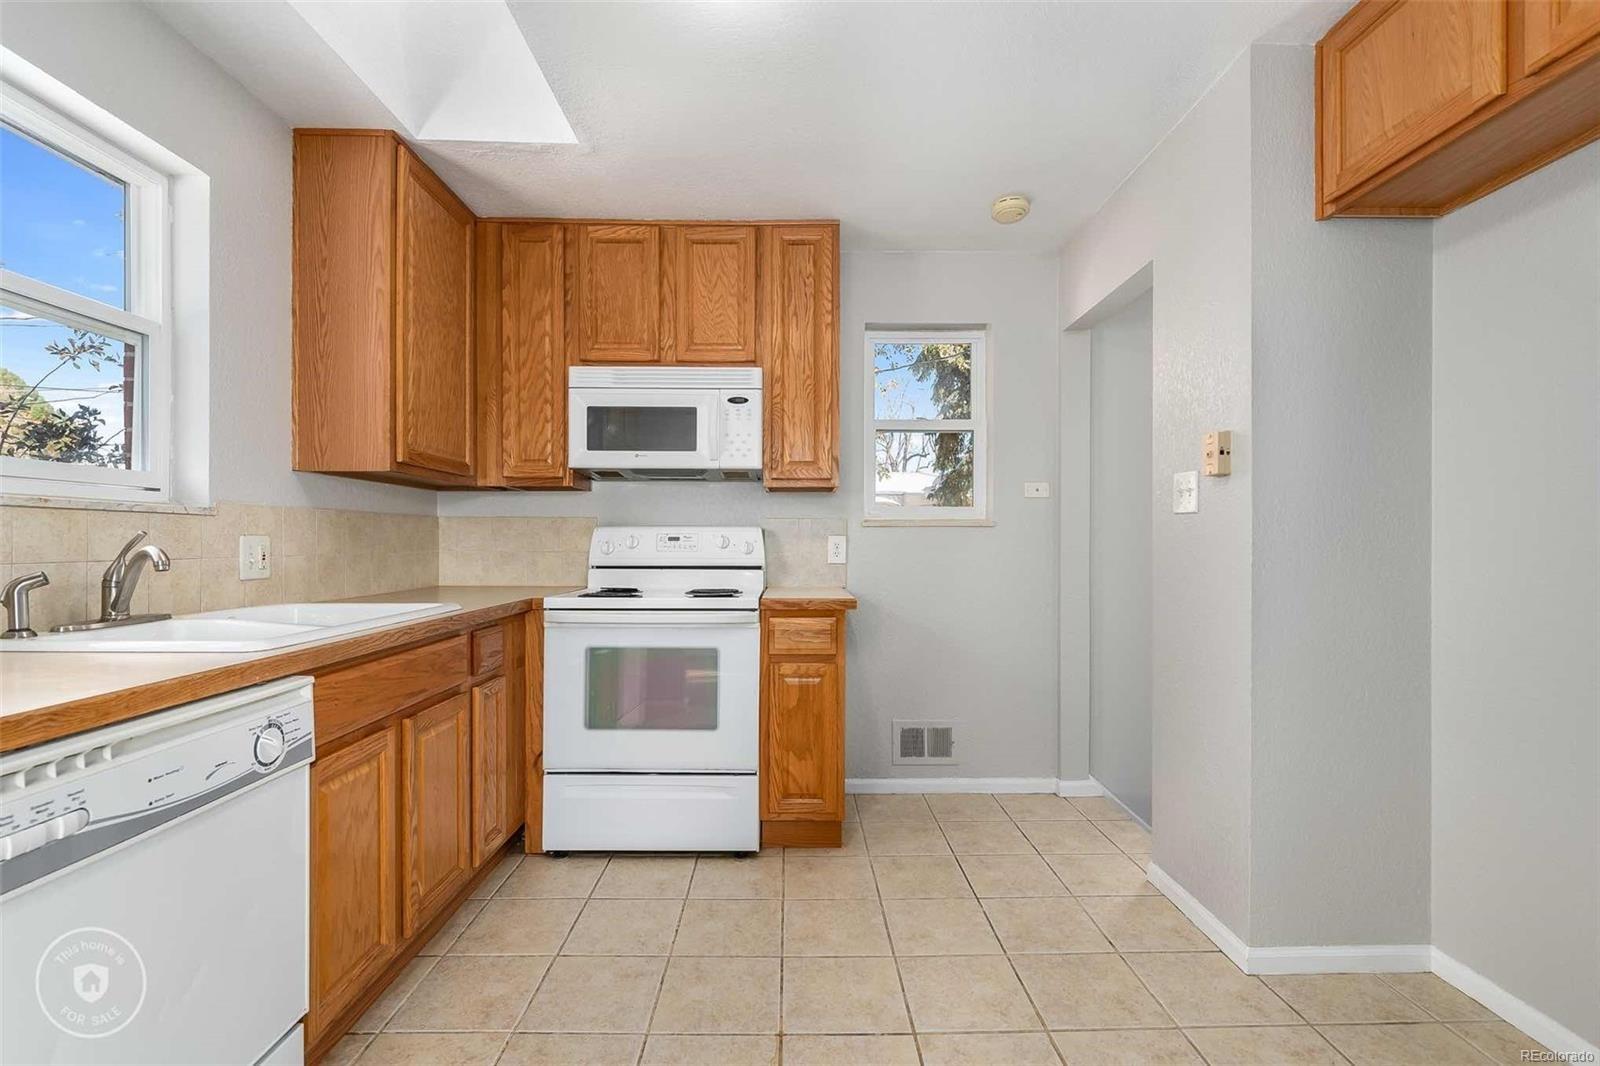 MLS# 5493482 - 3 - 2089 E 116th Avenue, Northglenn, CO 80233